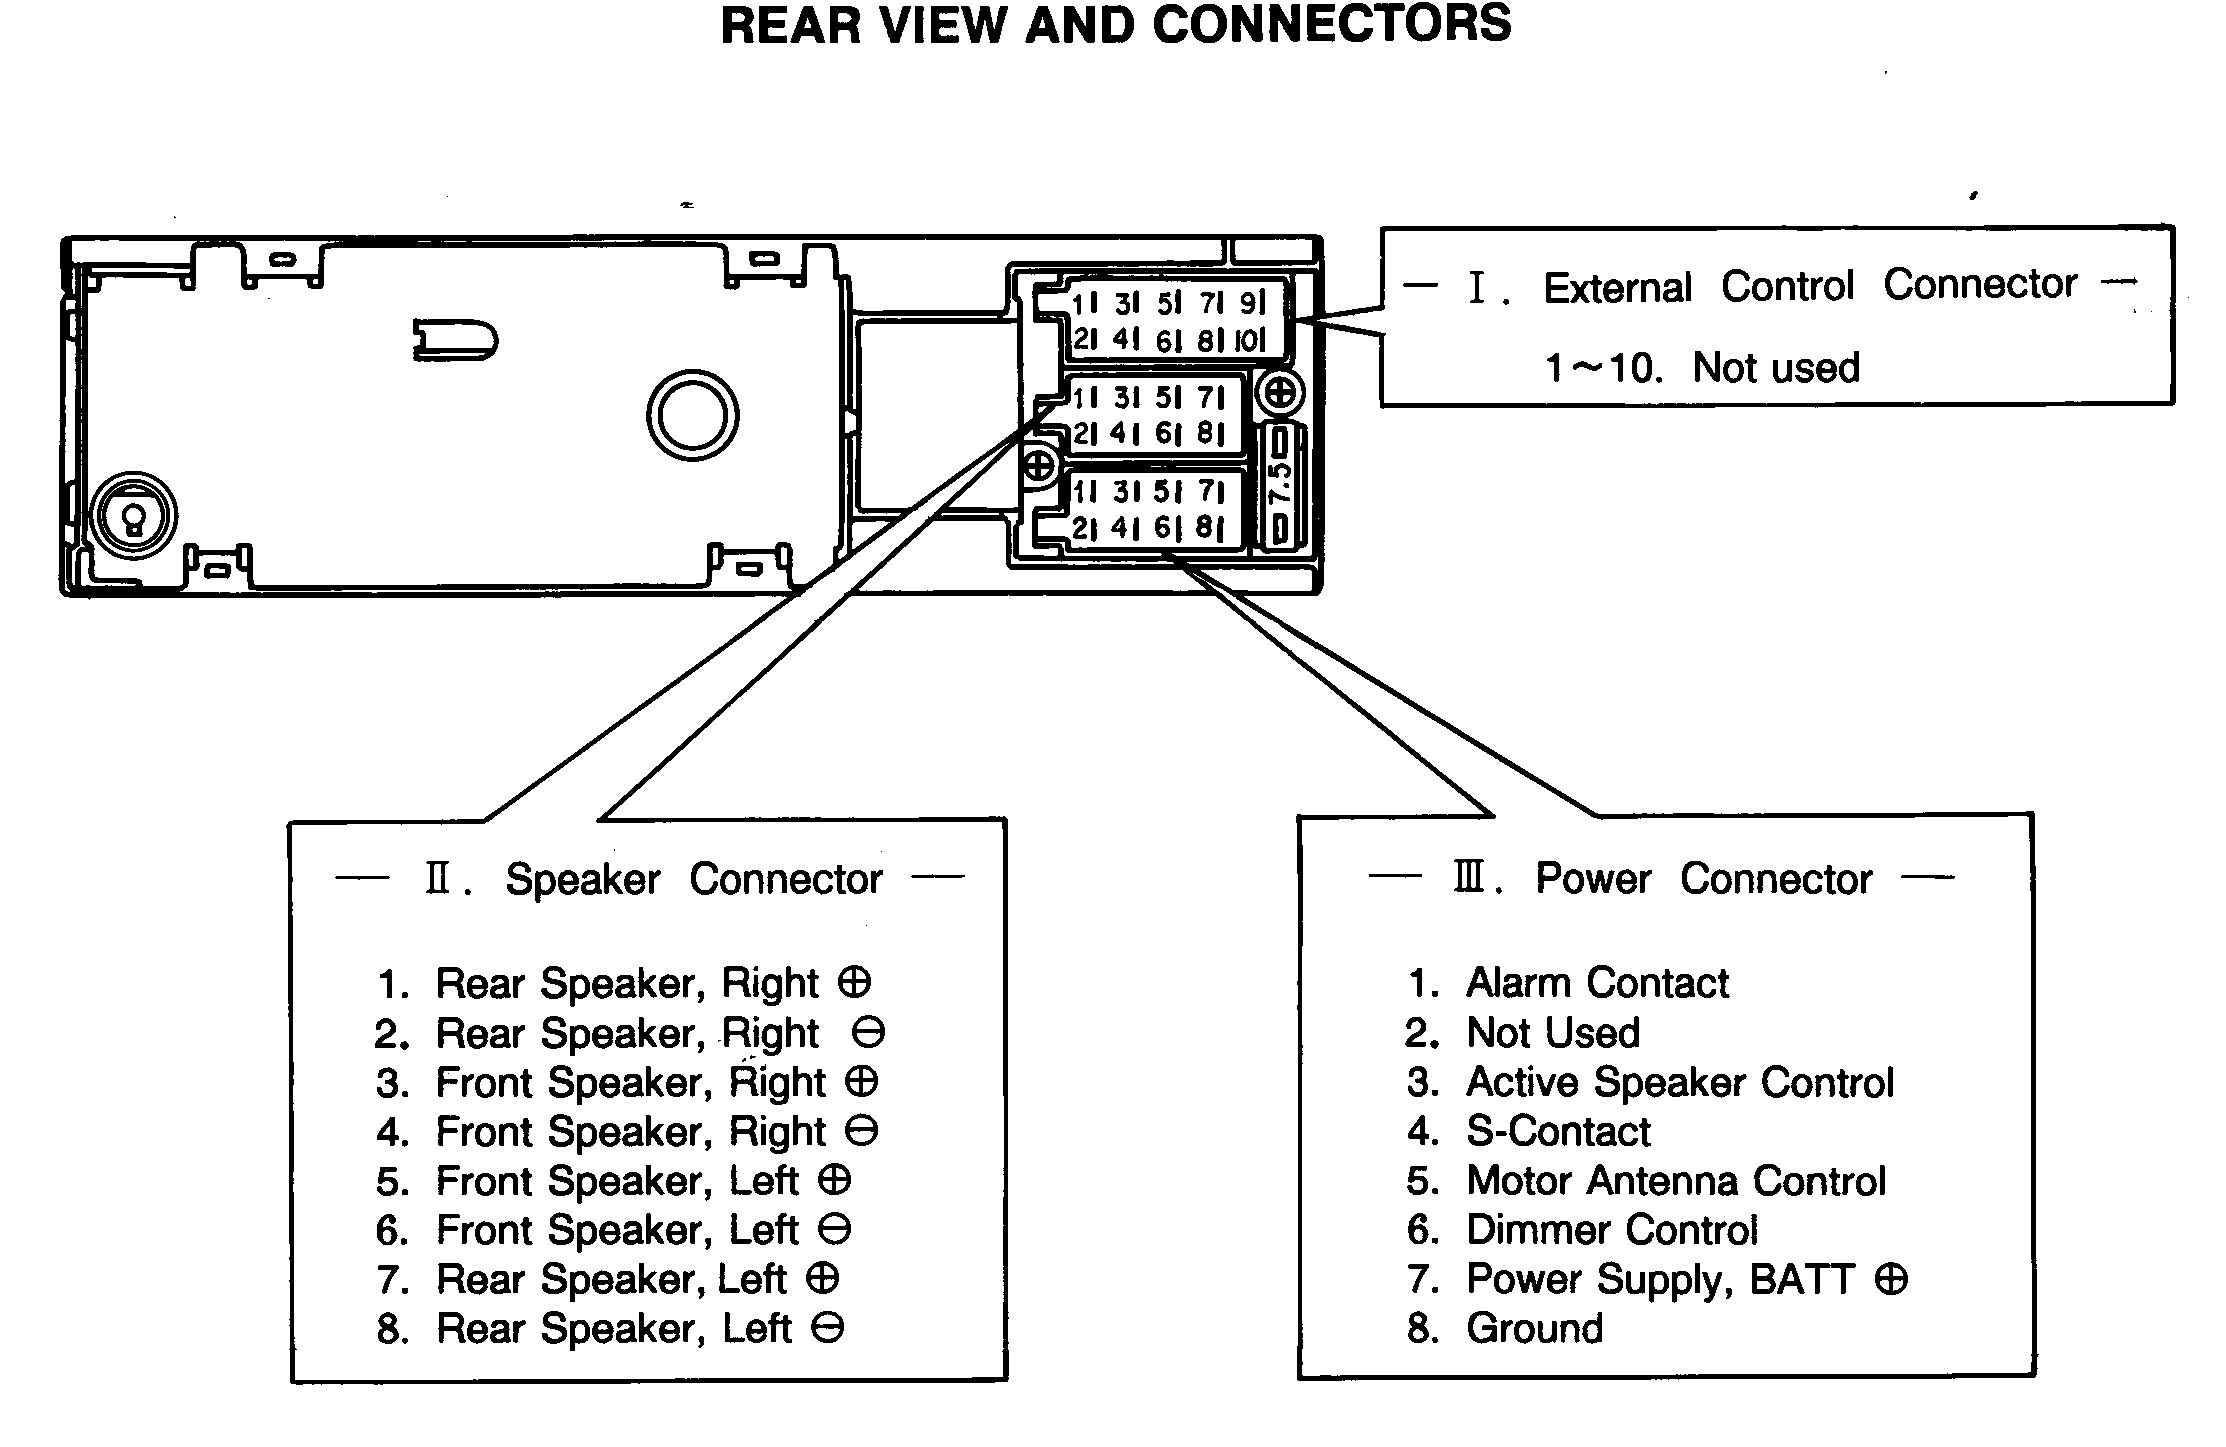 Car Wiring Diagrams Schematic Stator Diagram Blurts My Honda Stereo Of